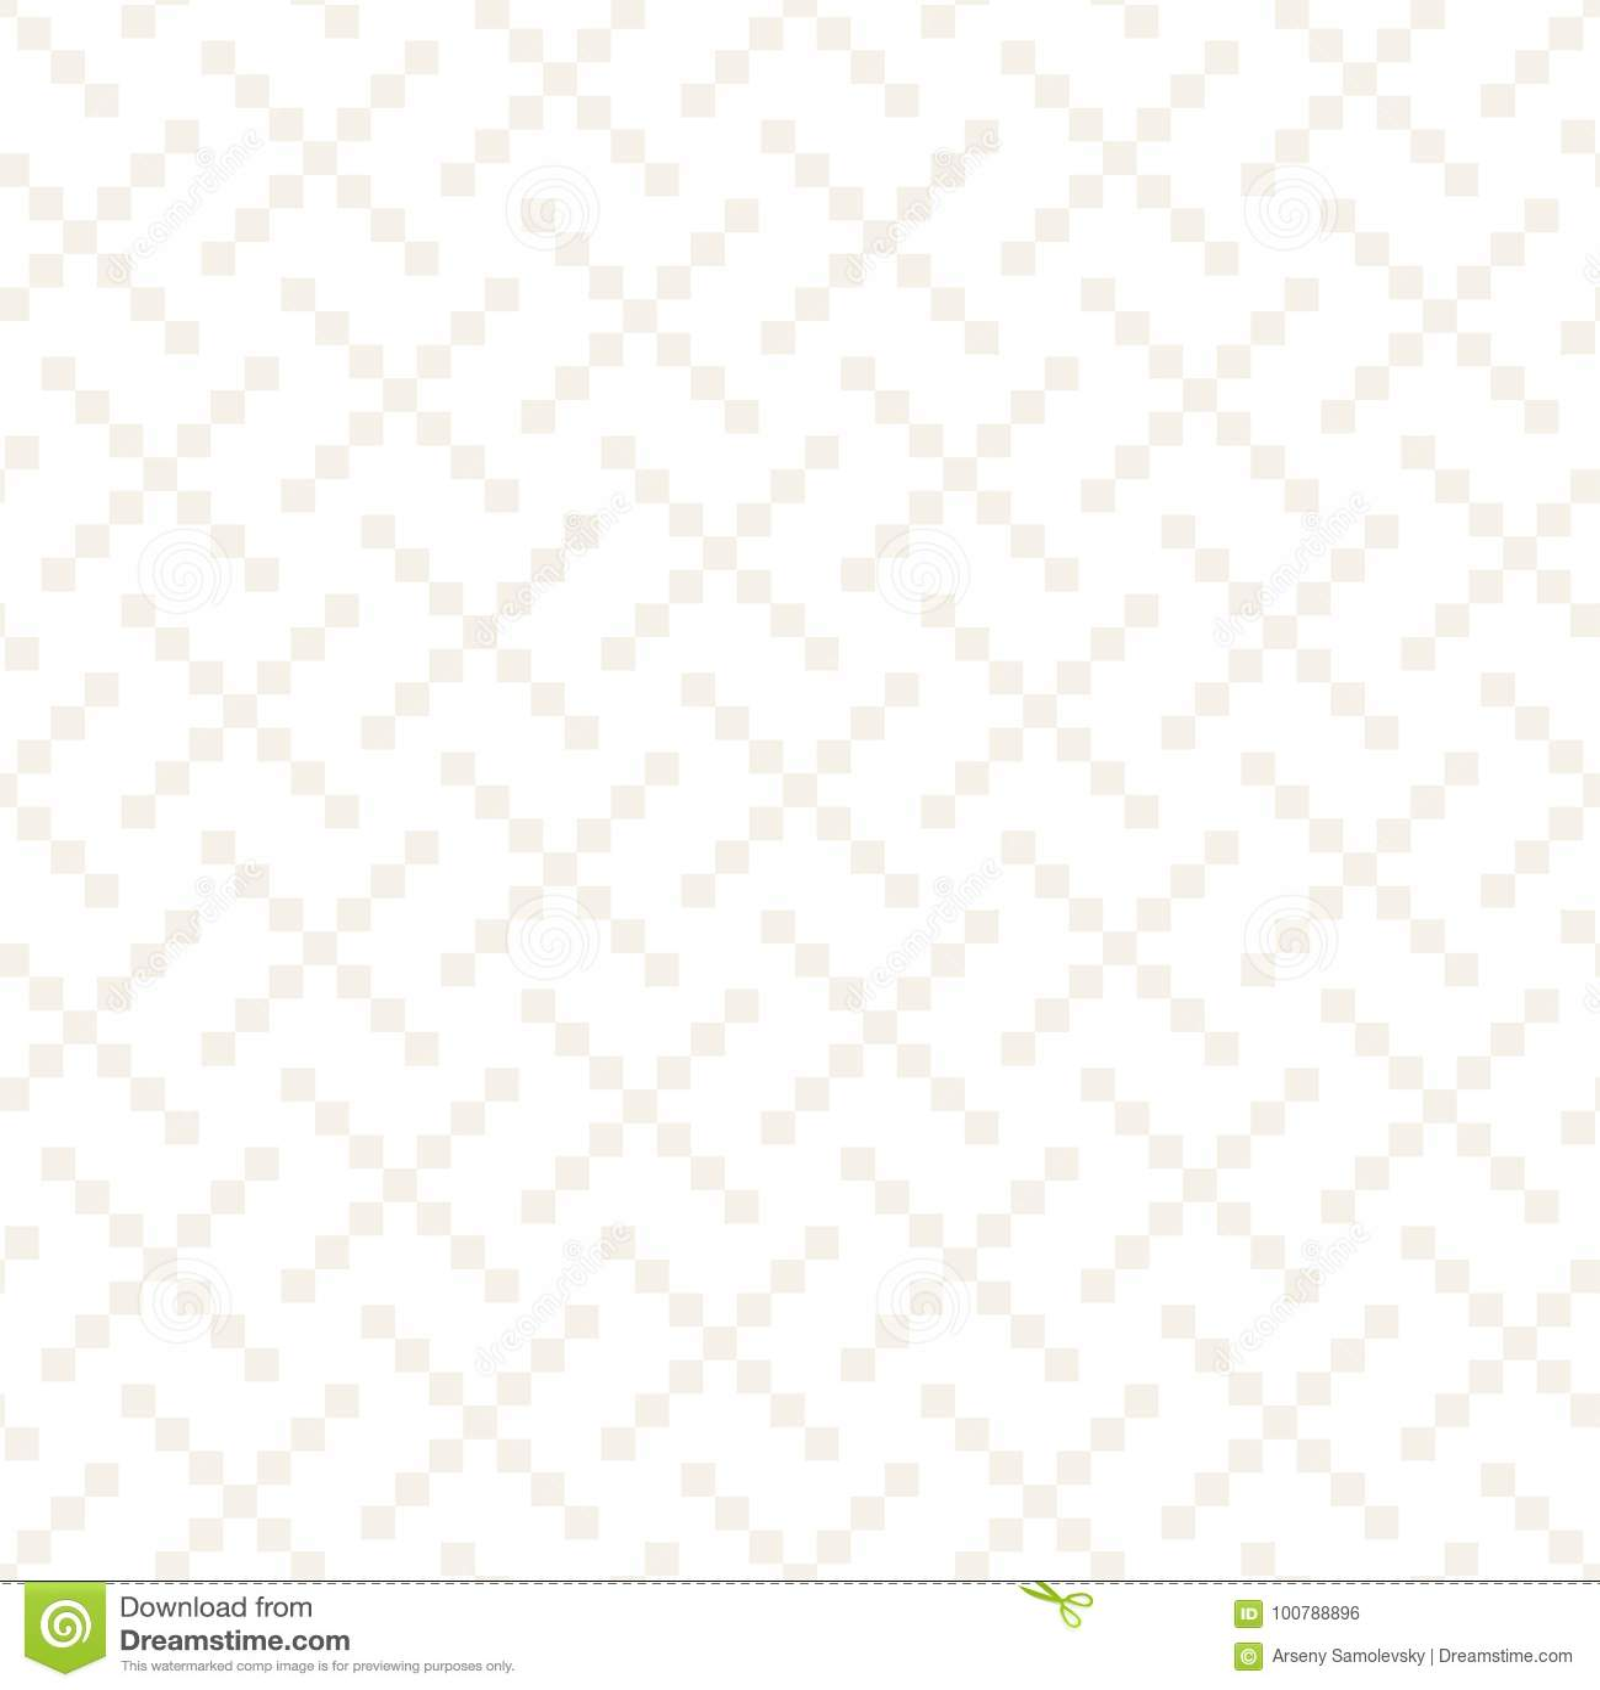 Seamless subtle cross lattice pattern. Abstract geometric tiling mosaic. Stylish background design